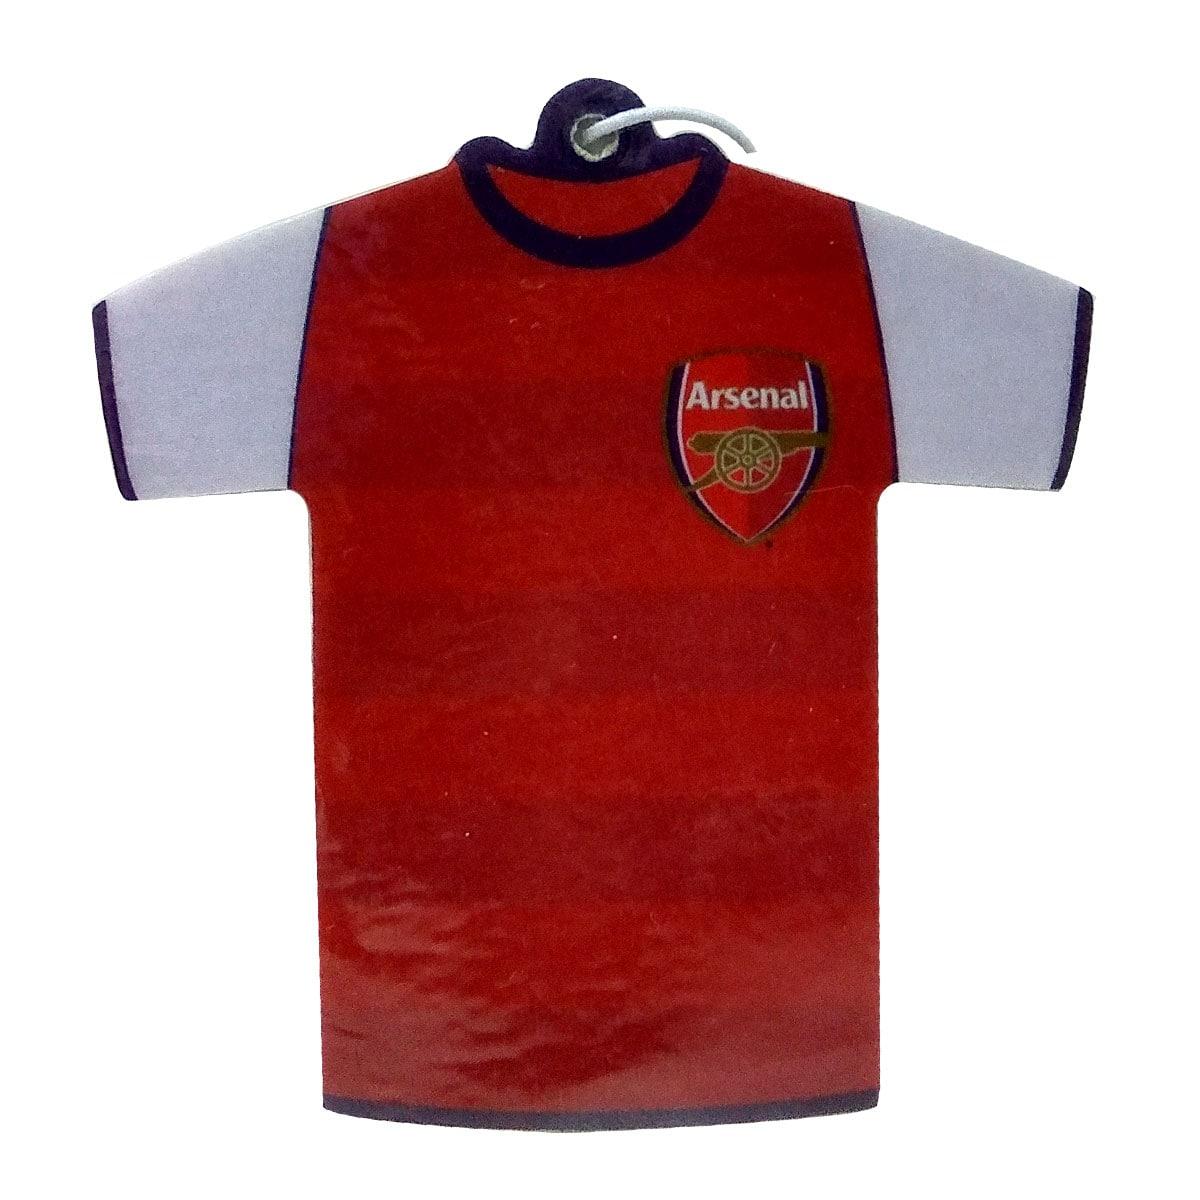 Arsenal F.C. Jersey Air Freshener - 1